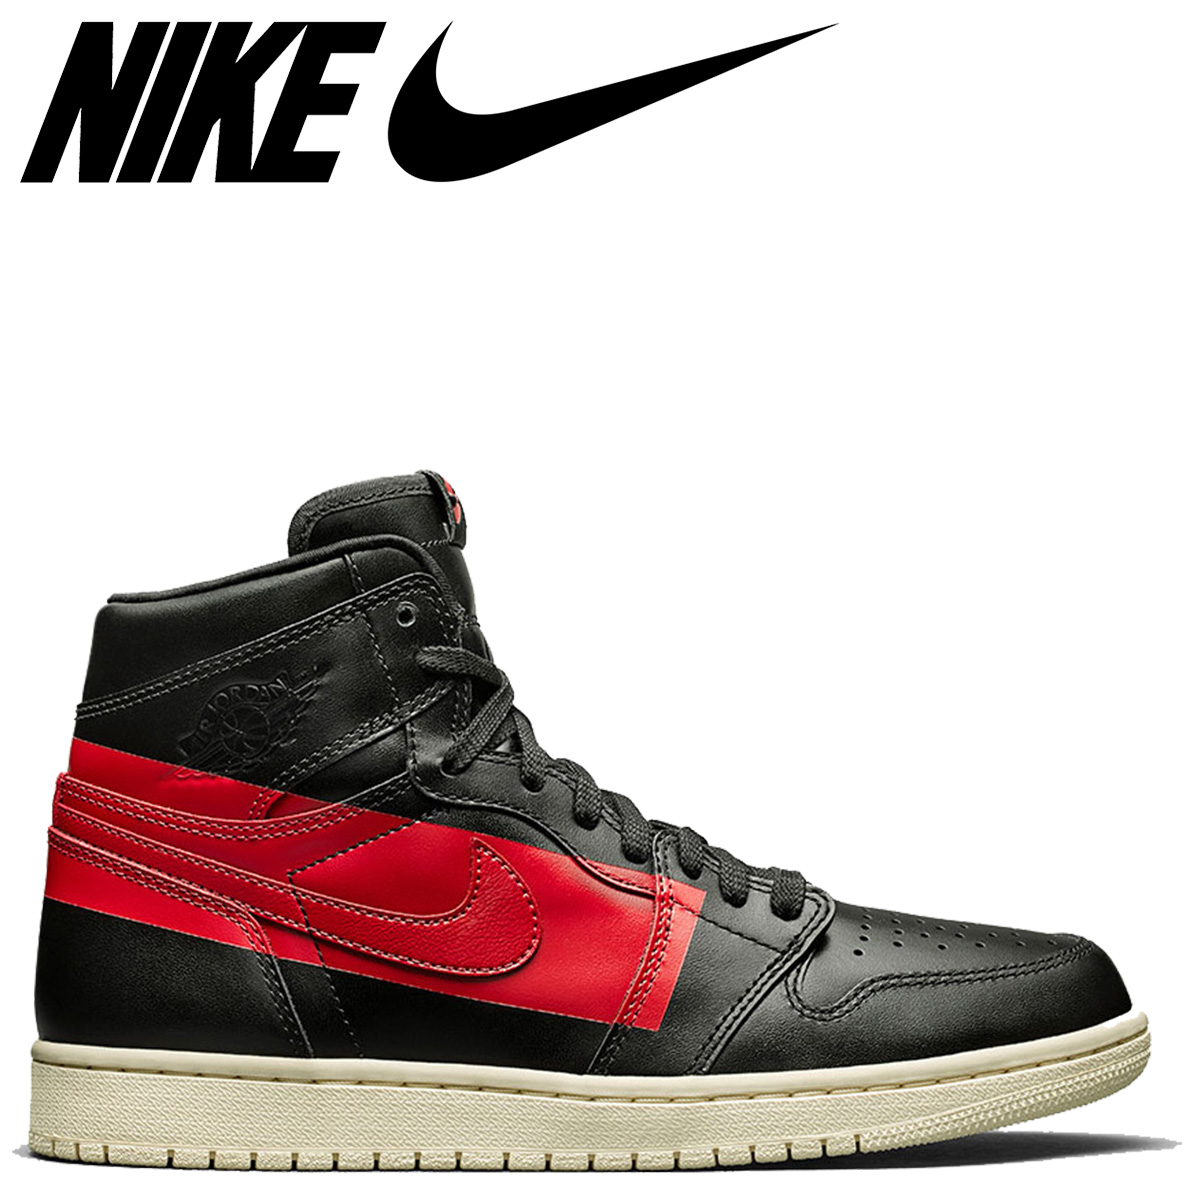 cute cheap large discount on wholesale NIKE AIR JORDAN 1 RETRO HIGH OG DEFIANT COUTURE Nike Air Jordan 1 nostalgic  high sneakers men black black BQ6682-006 [4/3 Shinnyu load]